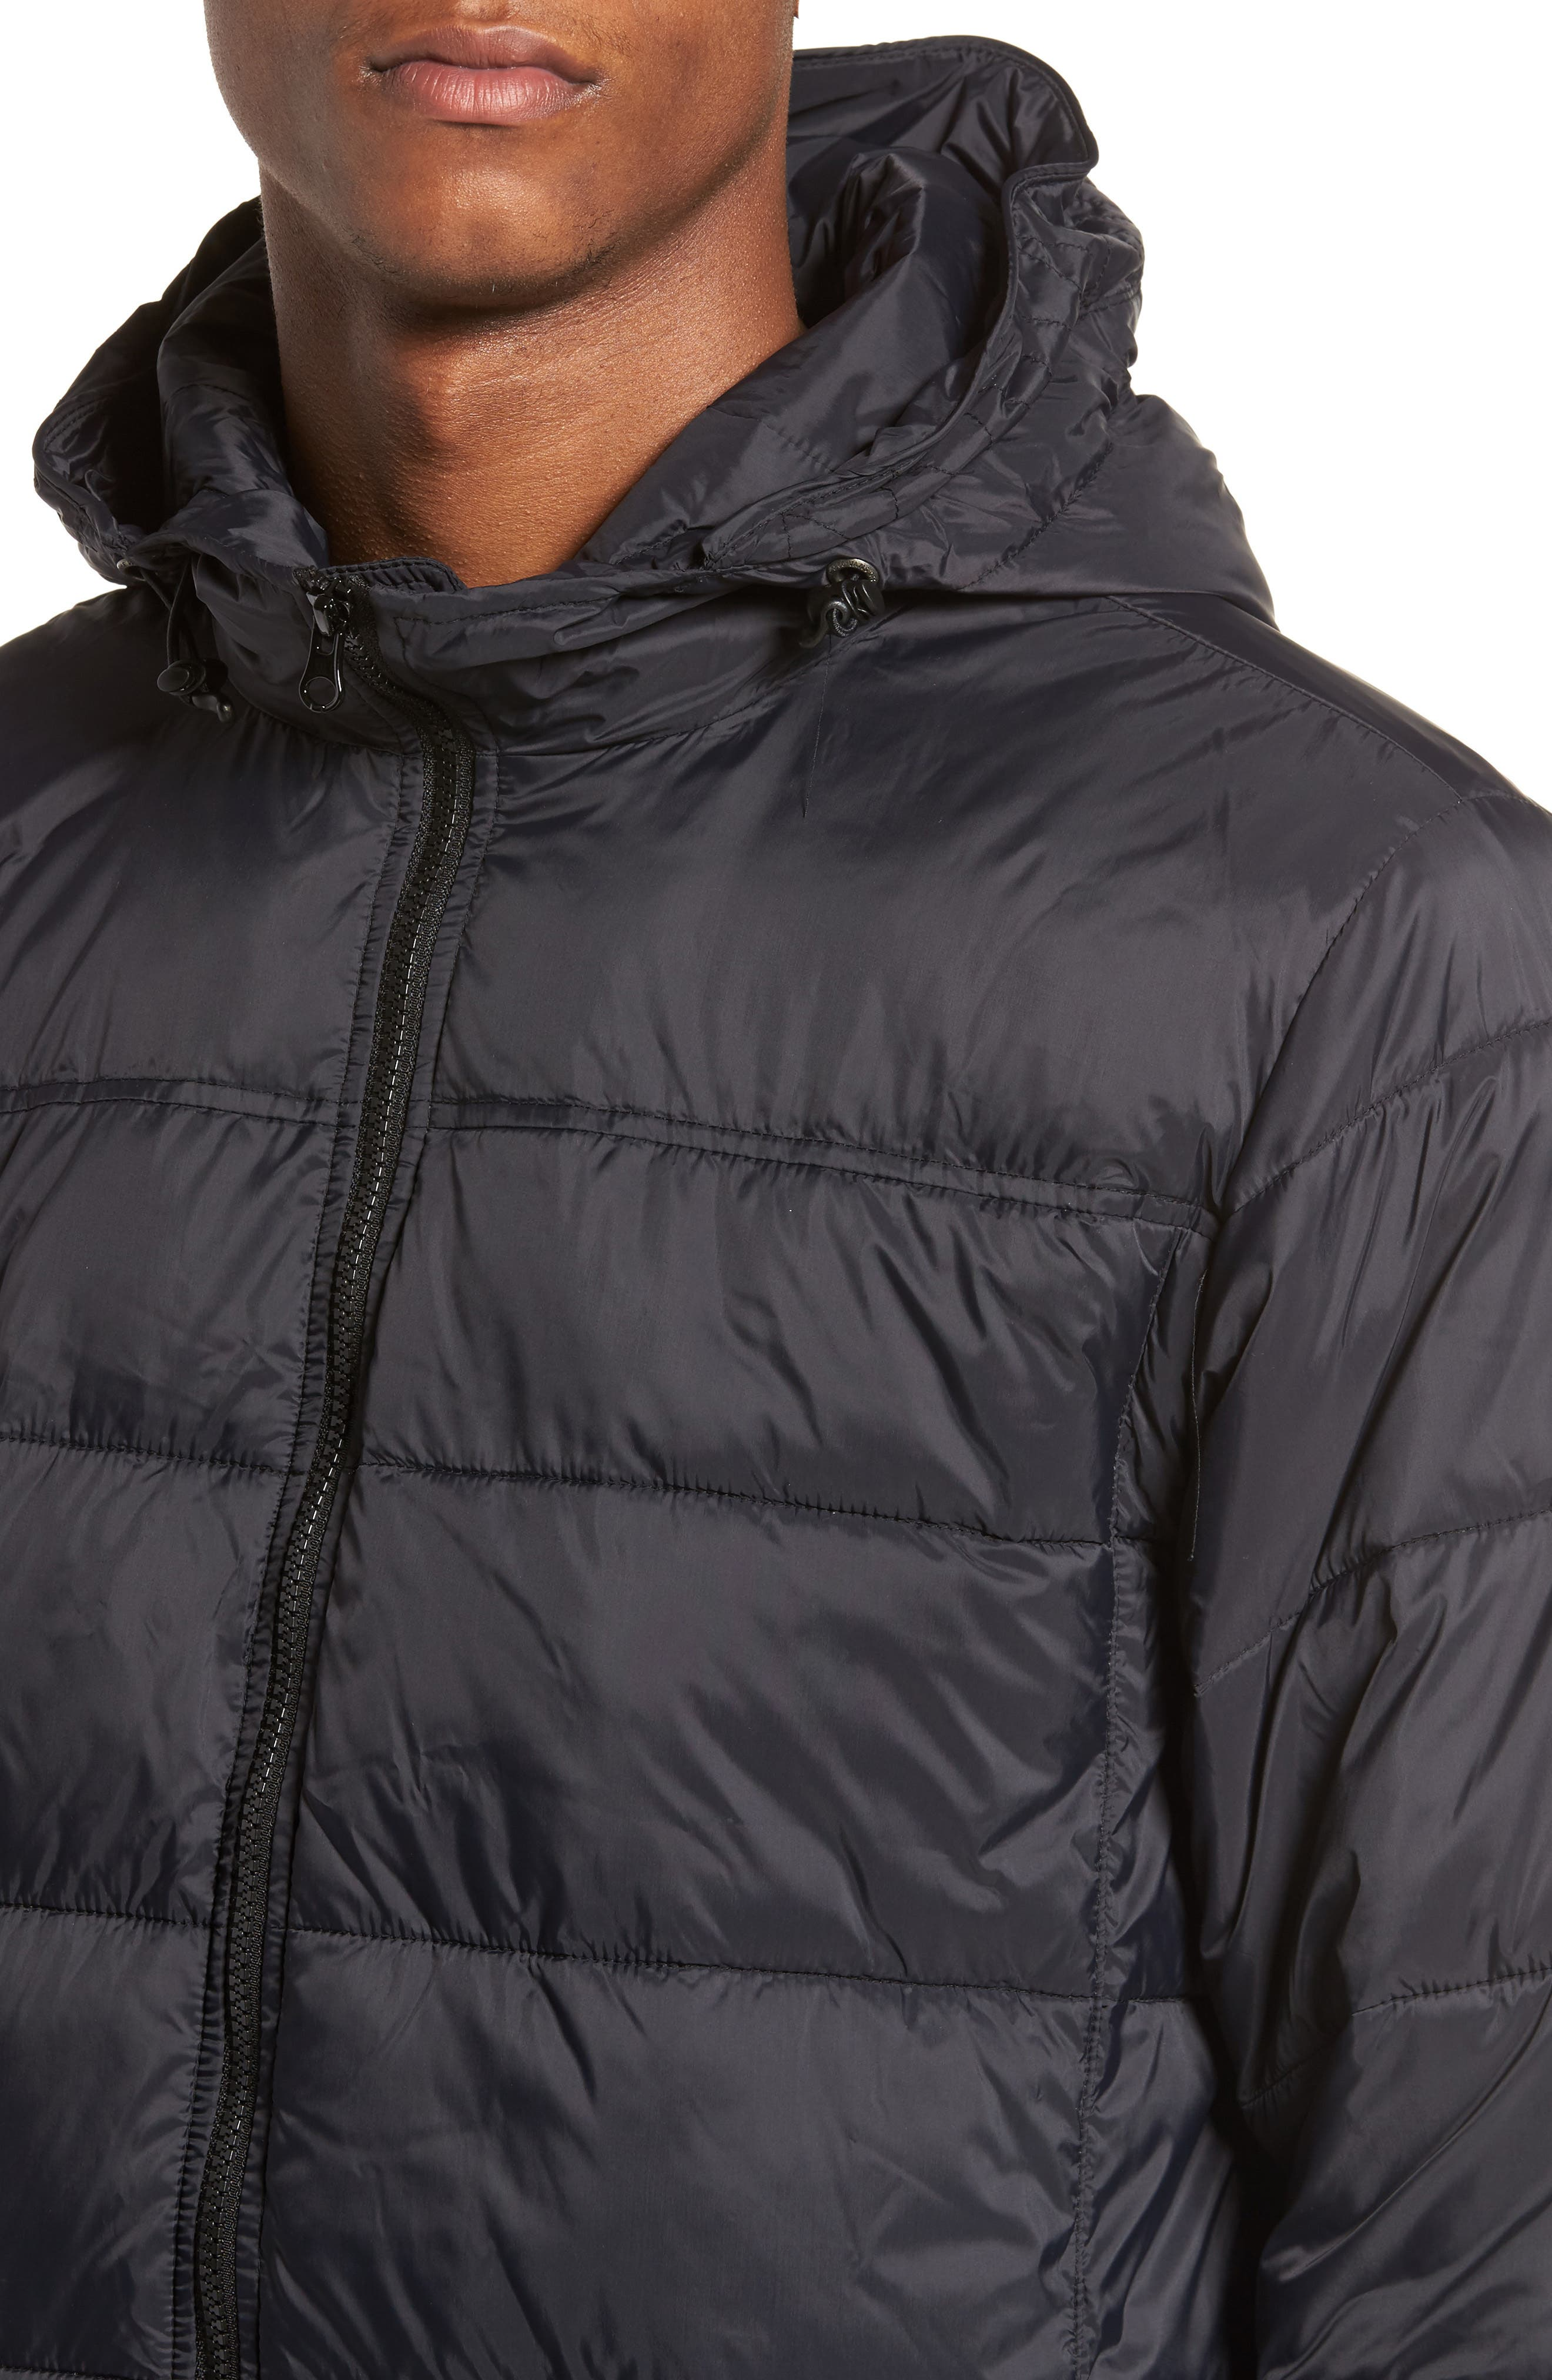 Woodcrest MTE Water Repellent Jacket,                             Alternate thumbnail 4, color,                             001